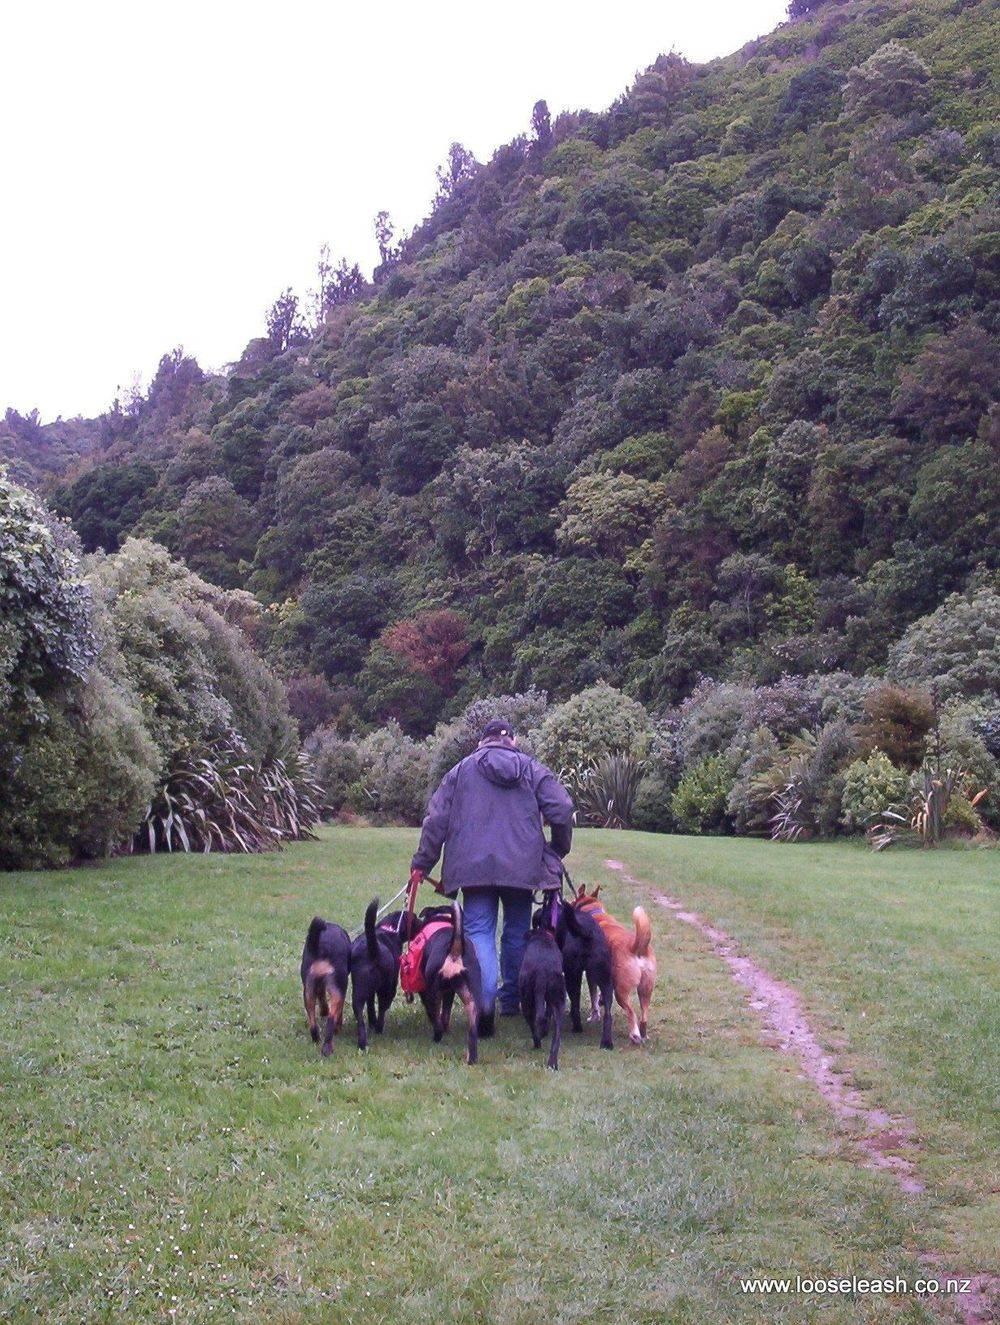 Newlands Dog Walker walking dogs at Otari Wiltons Bush Reserve Ngaio